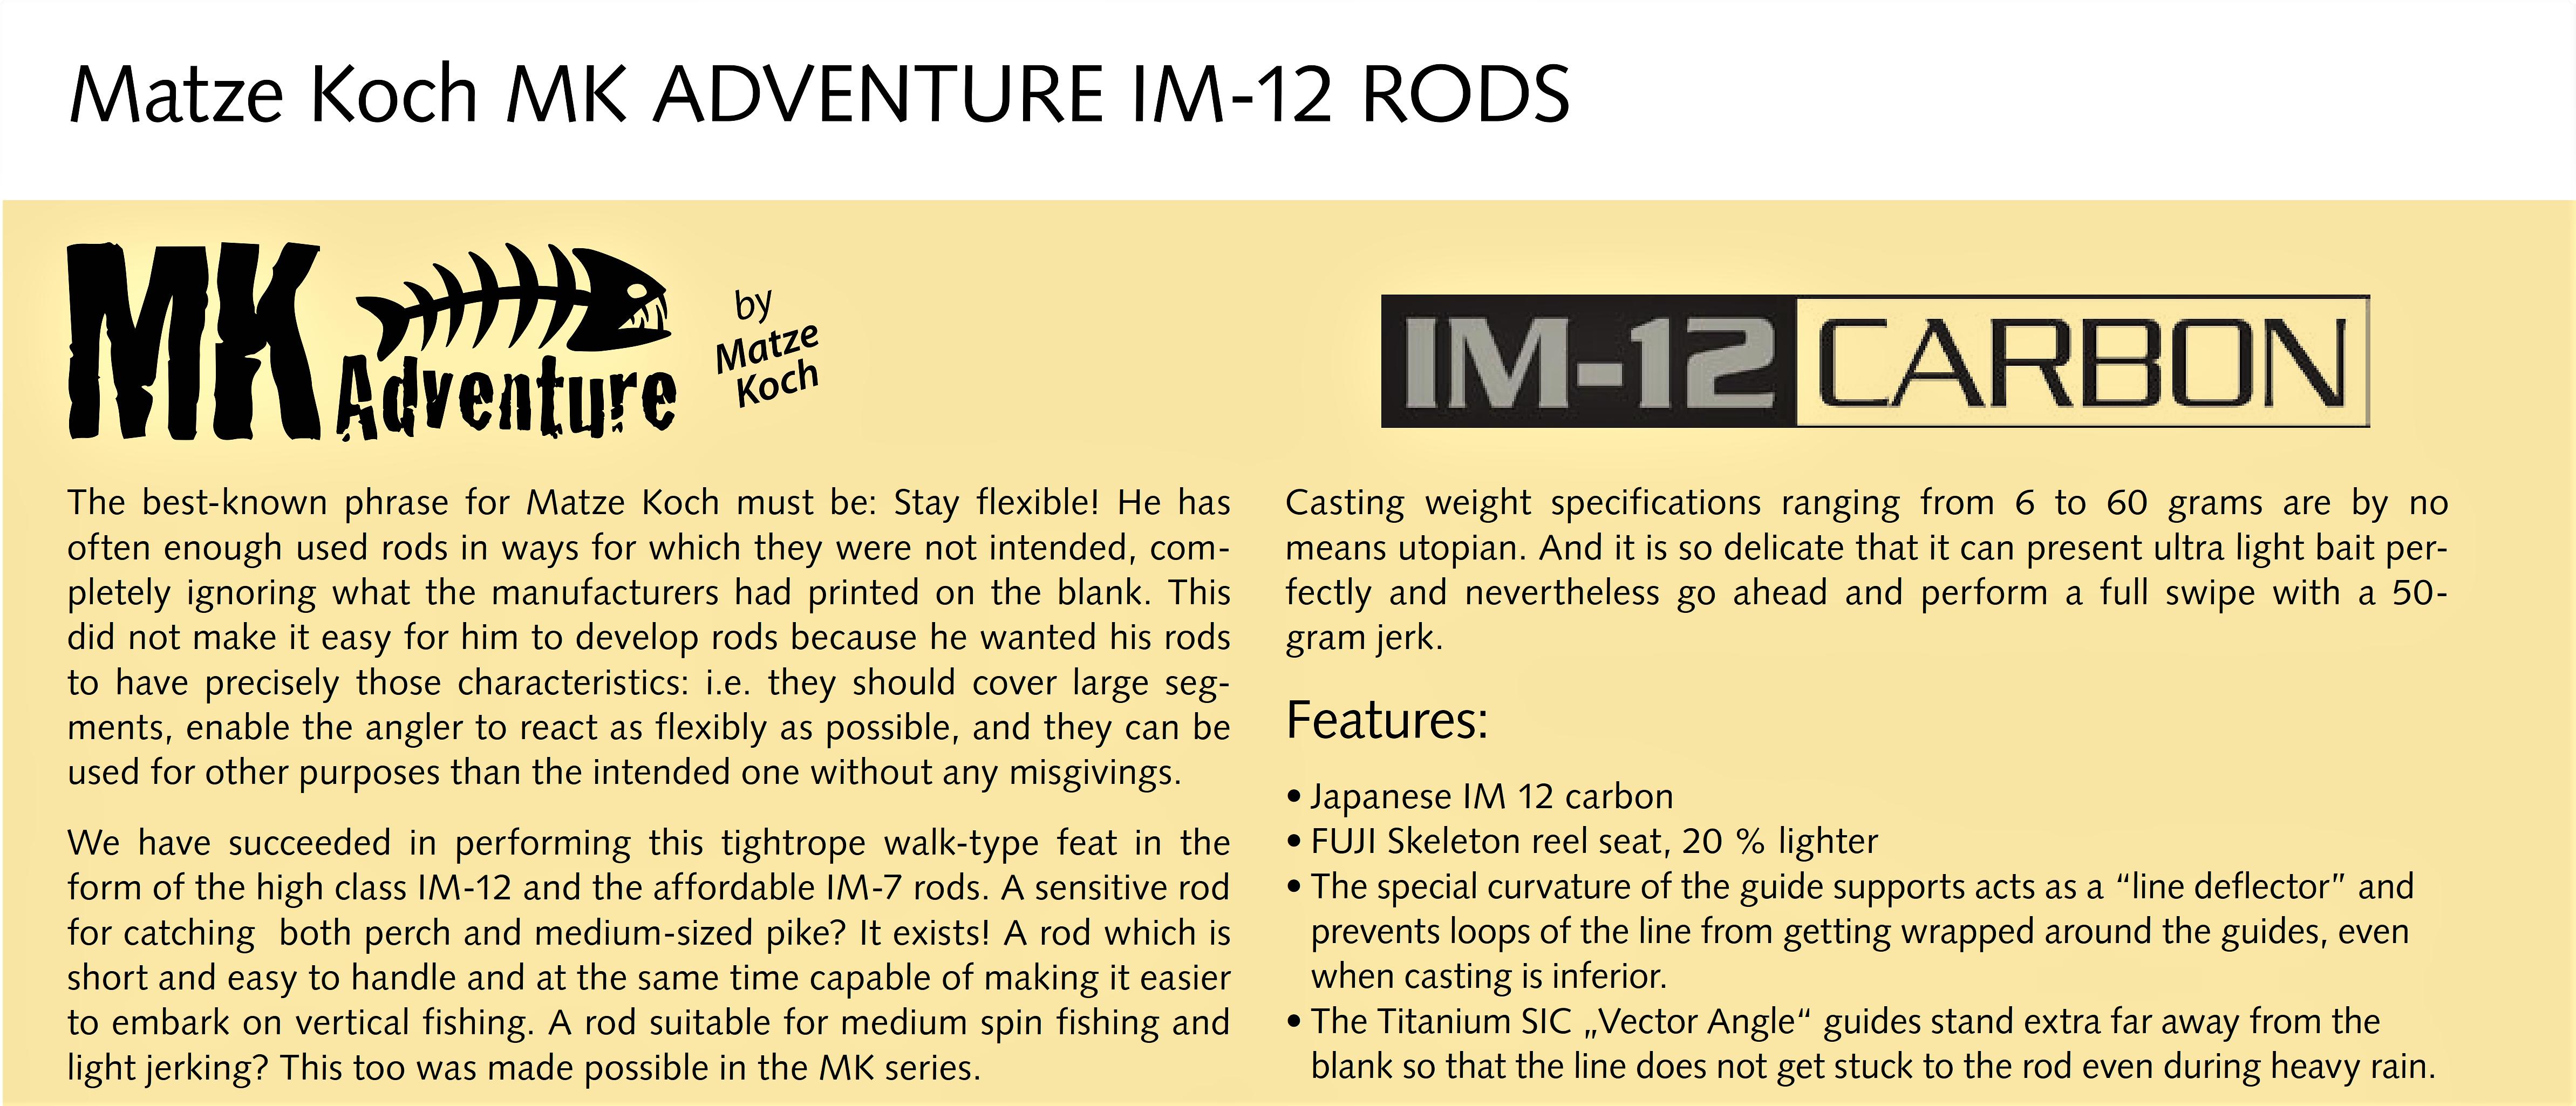 mk-adventure-im12.png